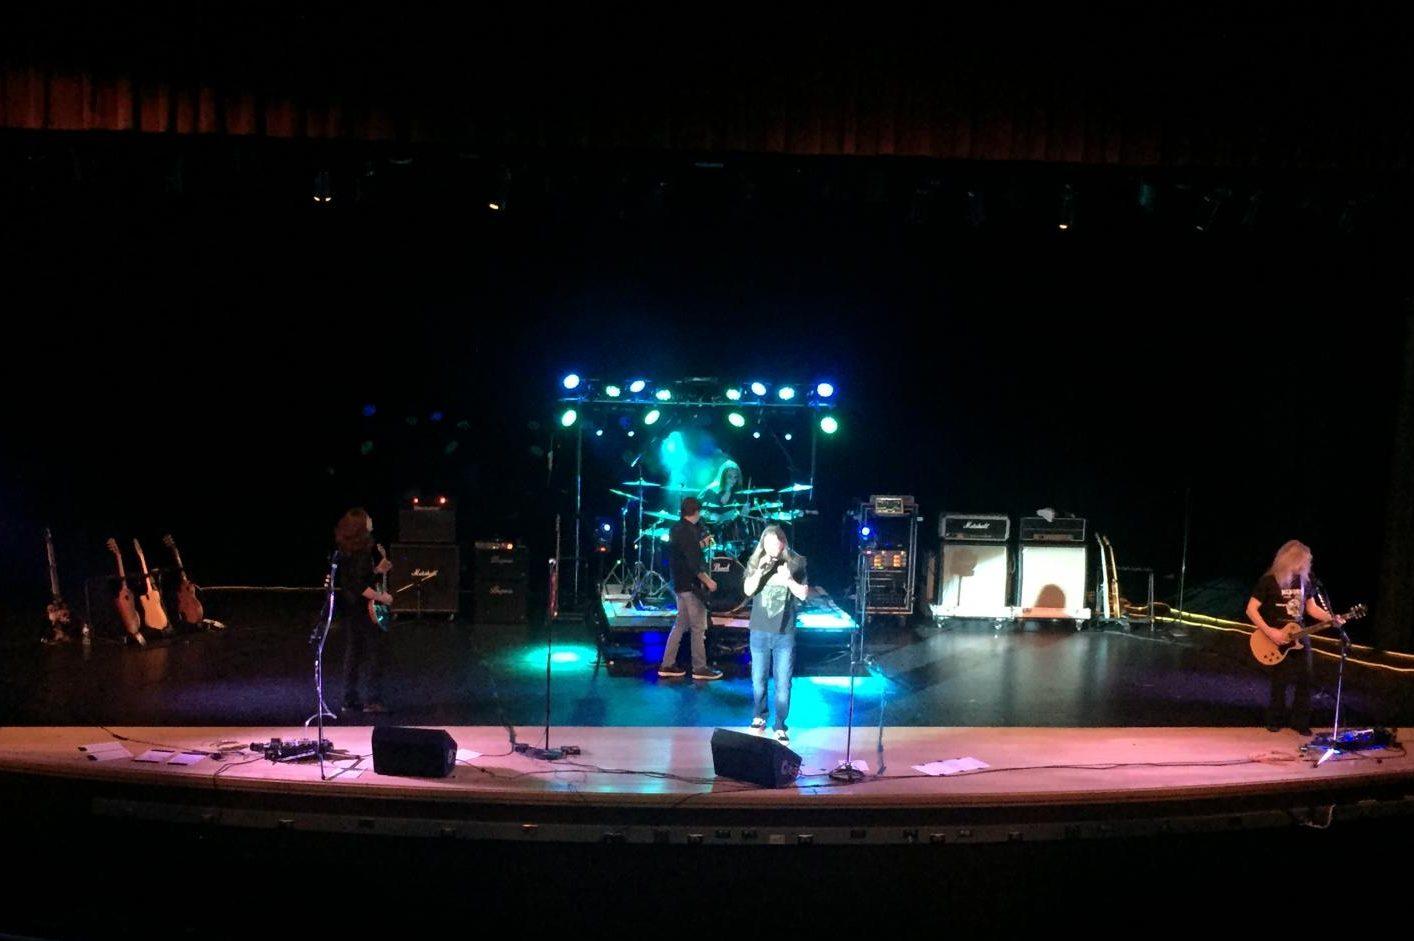 Nicholas Pare, Bob Pare, Alec Barnhart, Jeff Barnhart, and Kyle Stuhler perform at the concert.